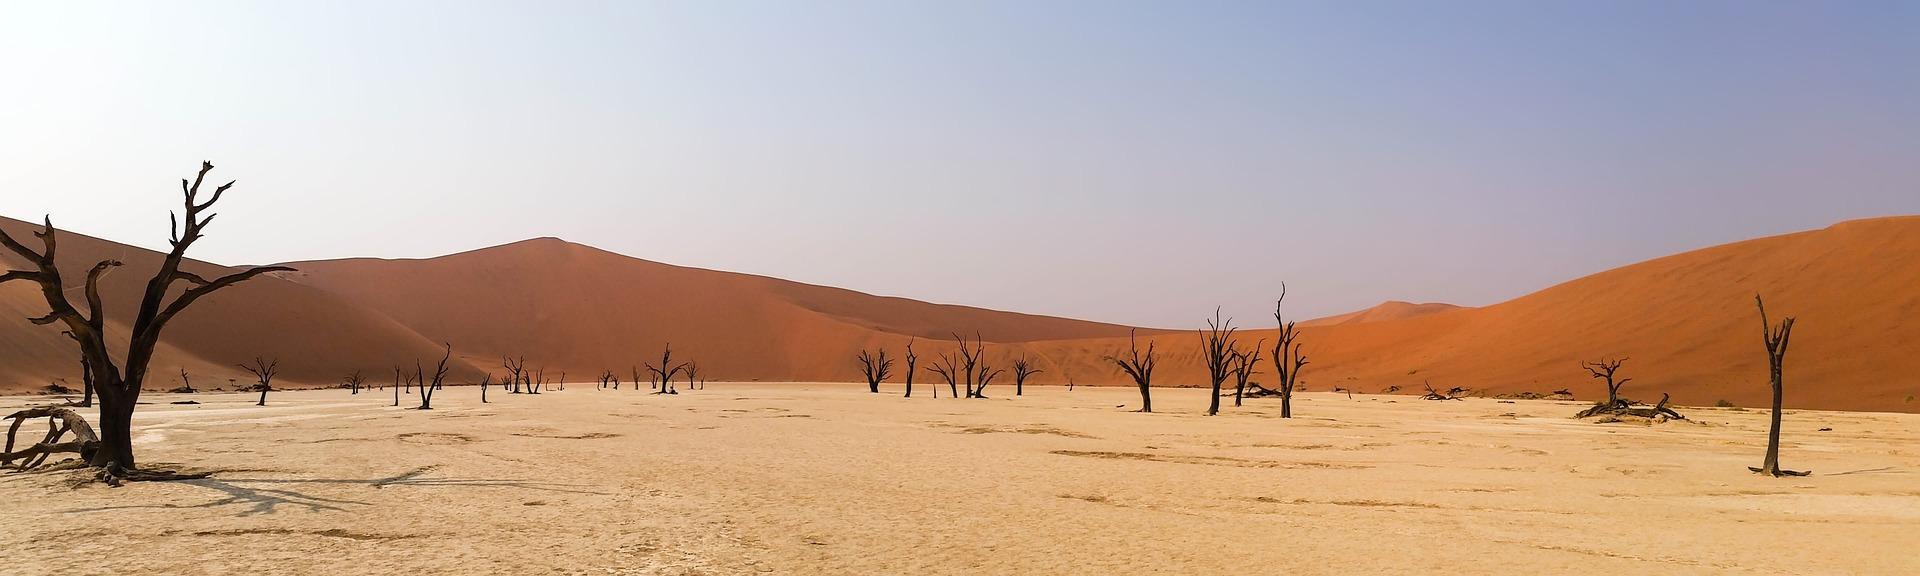 Wüstentour in Namibia